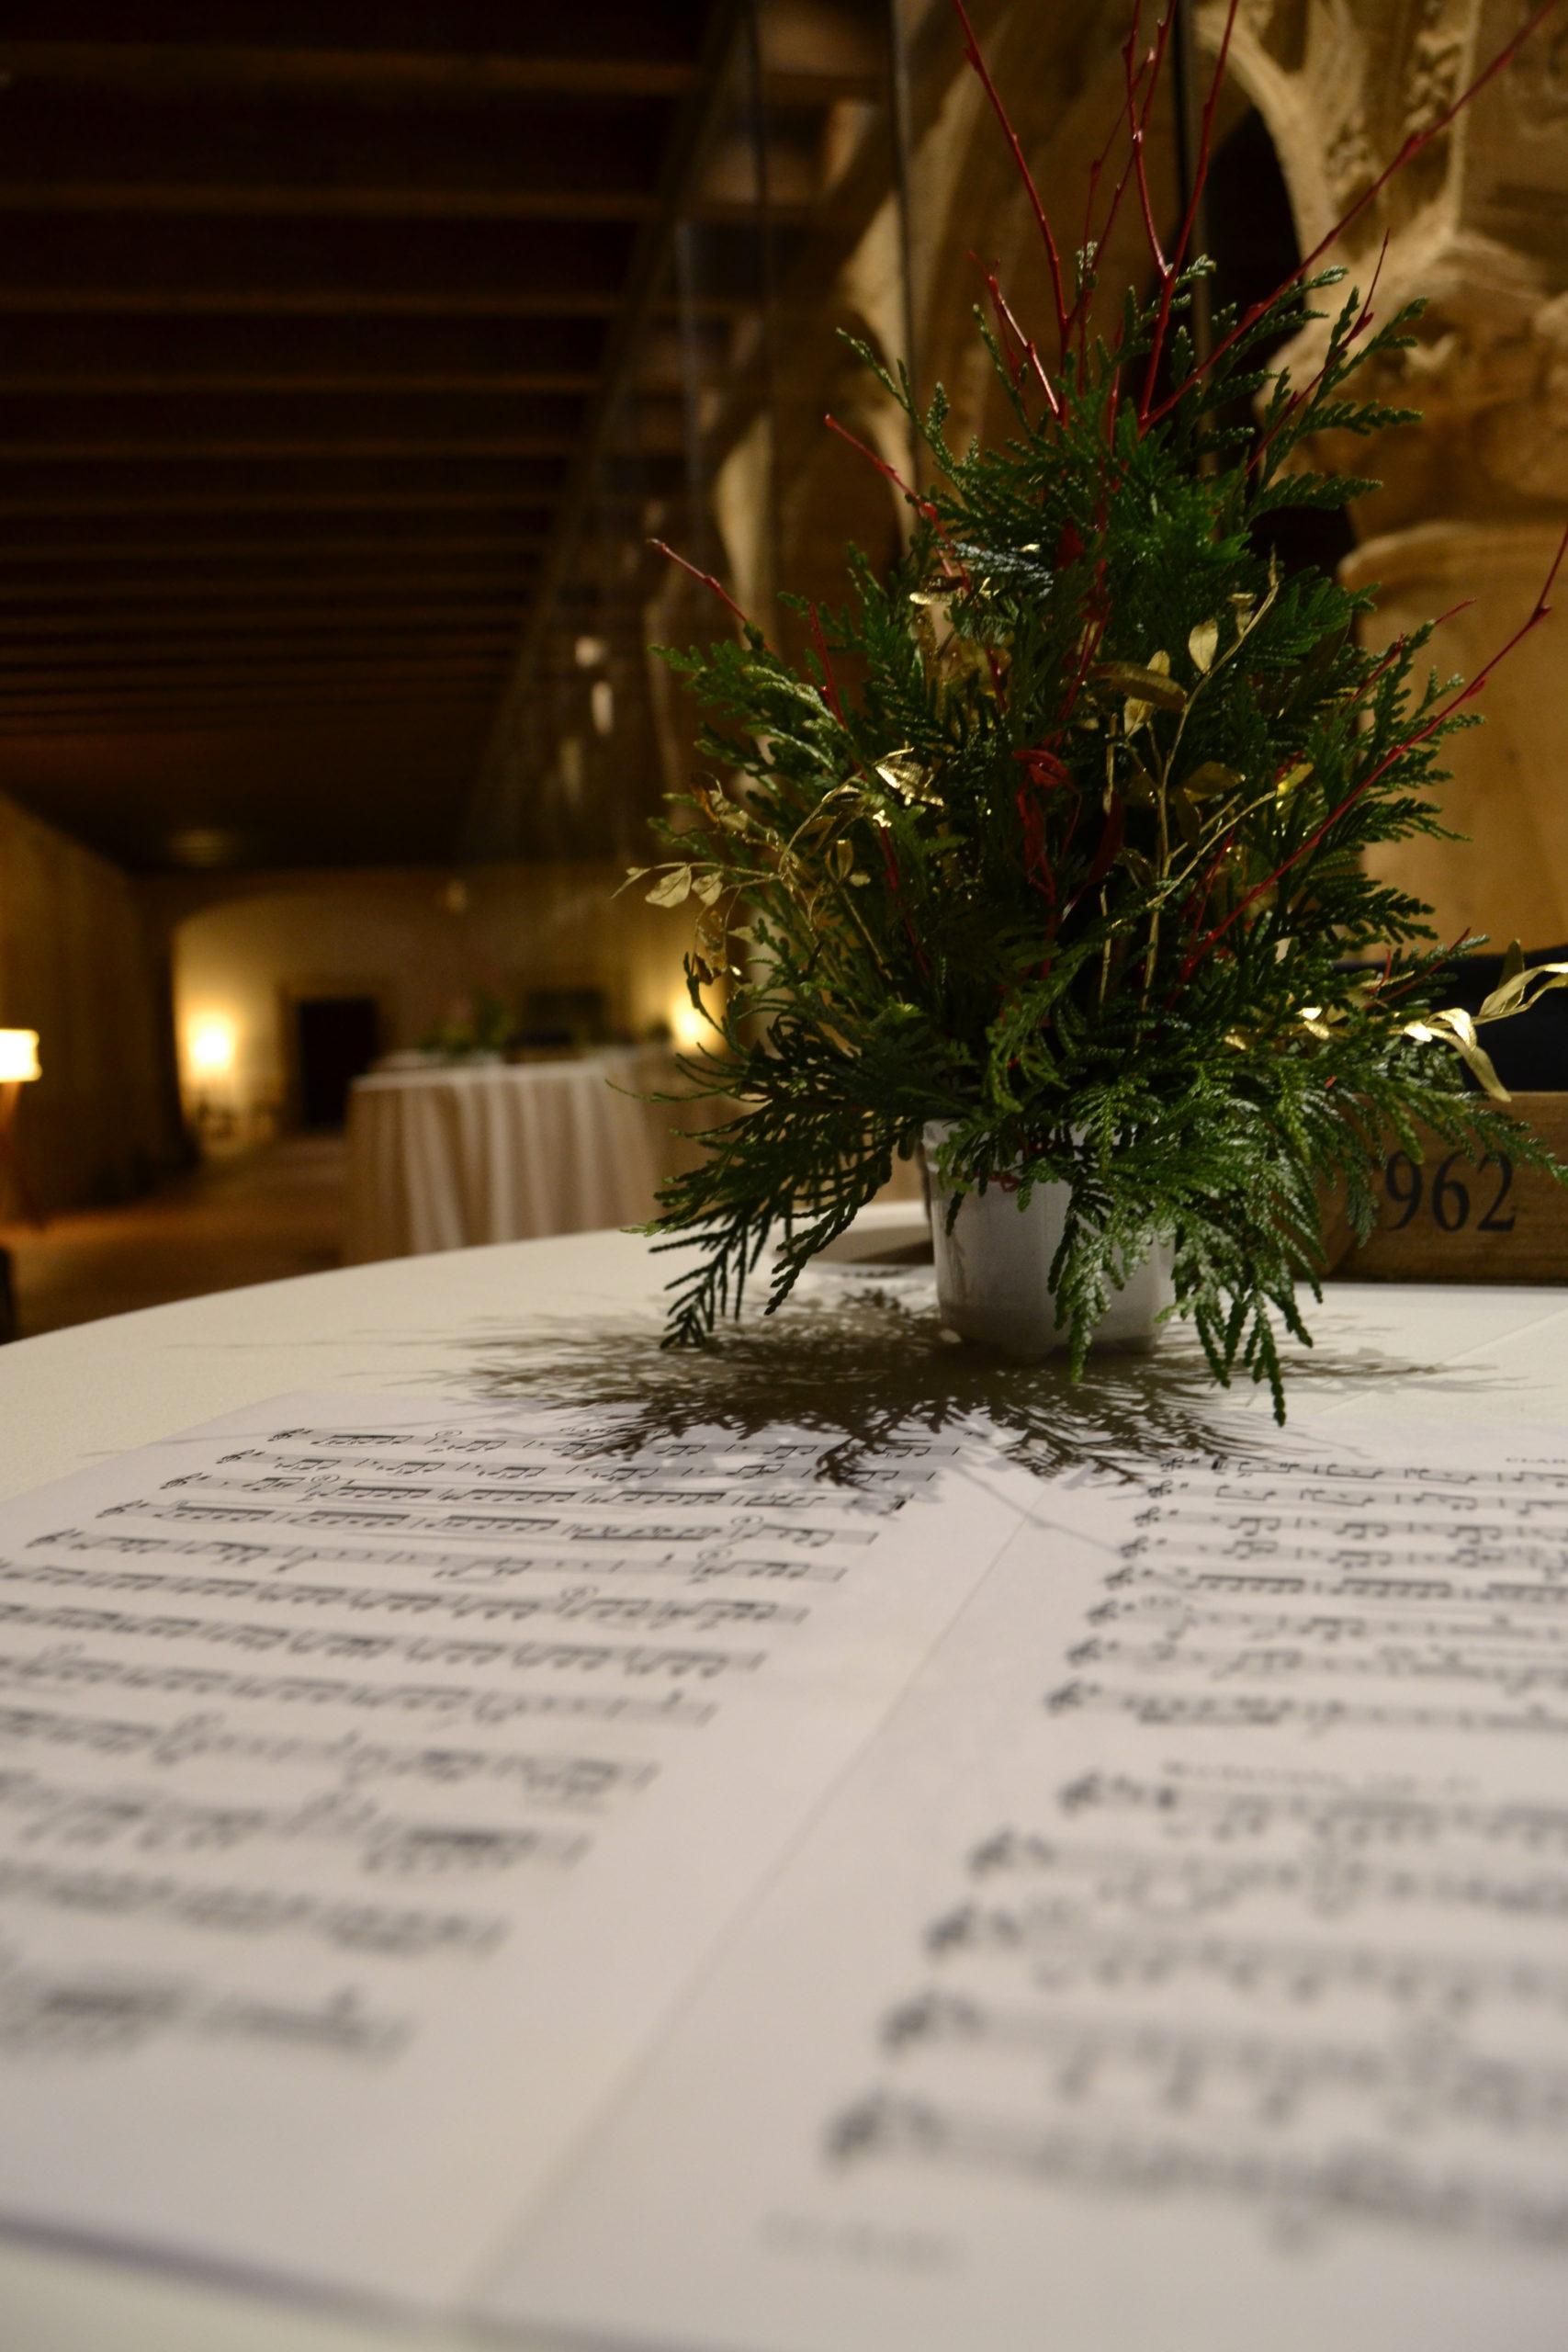 Partitura de música del grupo cuarteto Scherzo en Cóctel en Valbuena